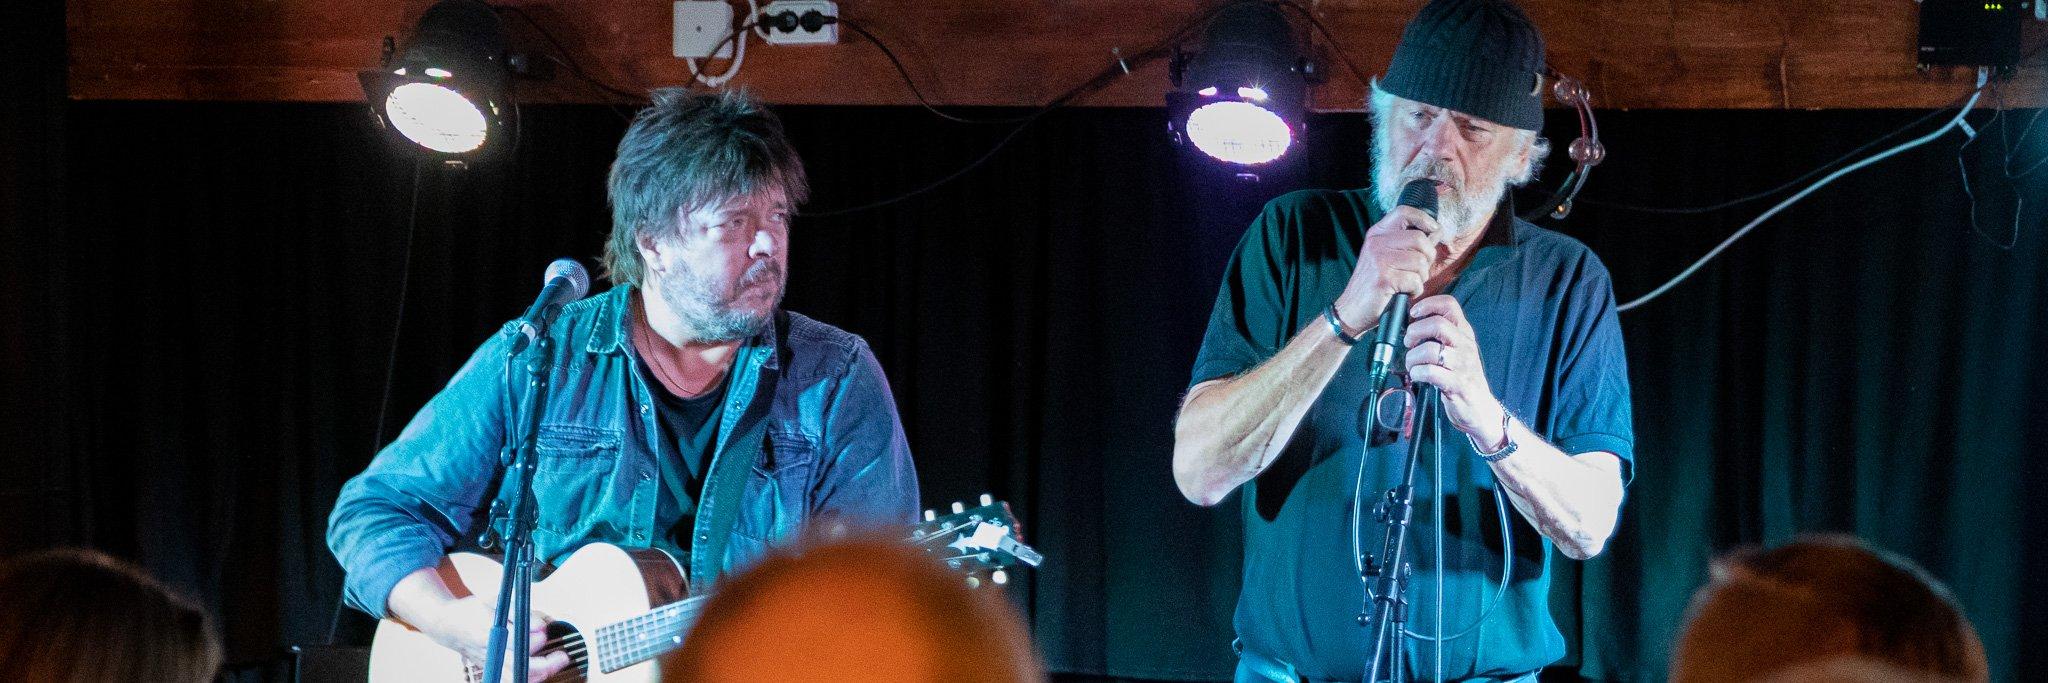 Ronny Eriksson & Leo Holmberg